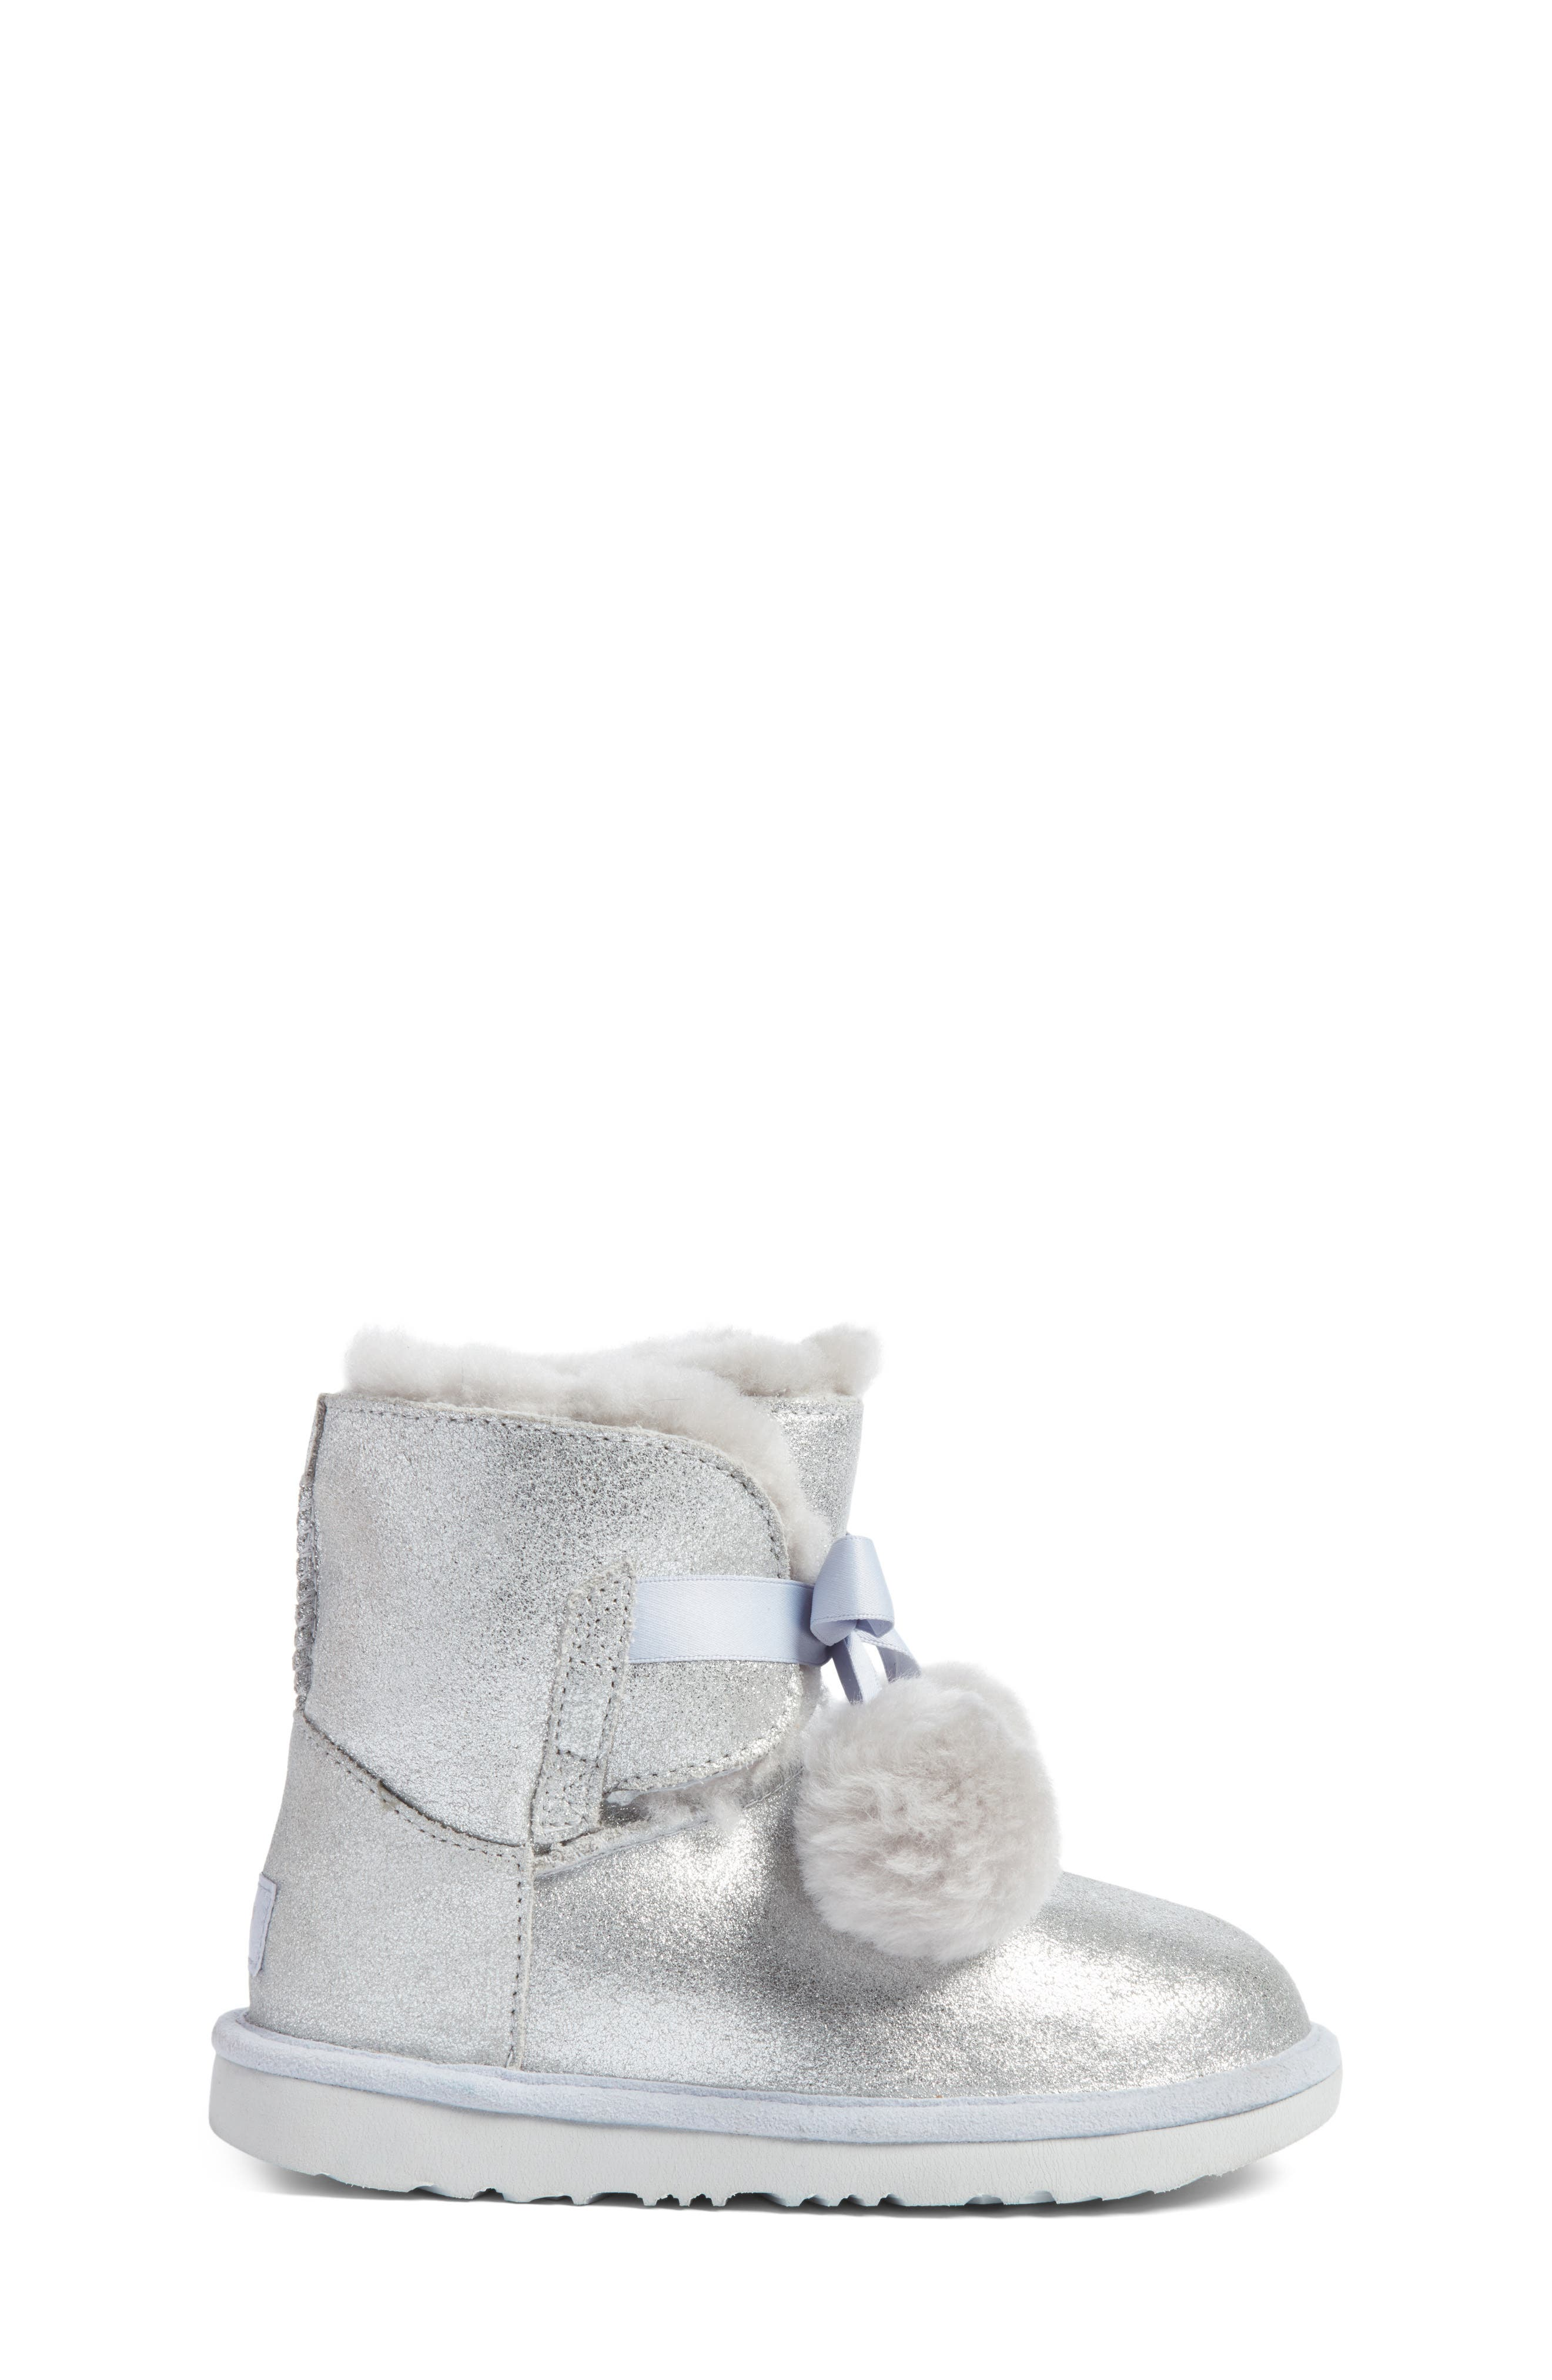 Alternate Image 3  - UGG® Gita Metallic Genuine Shearling Pom Bootie (Walker, Toddler, Little Kid & Big Kid)